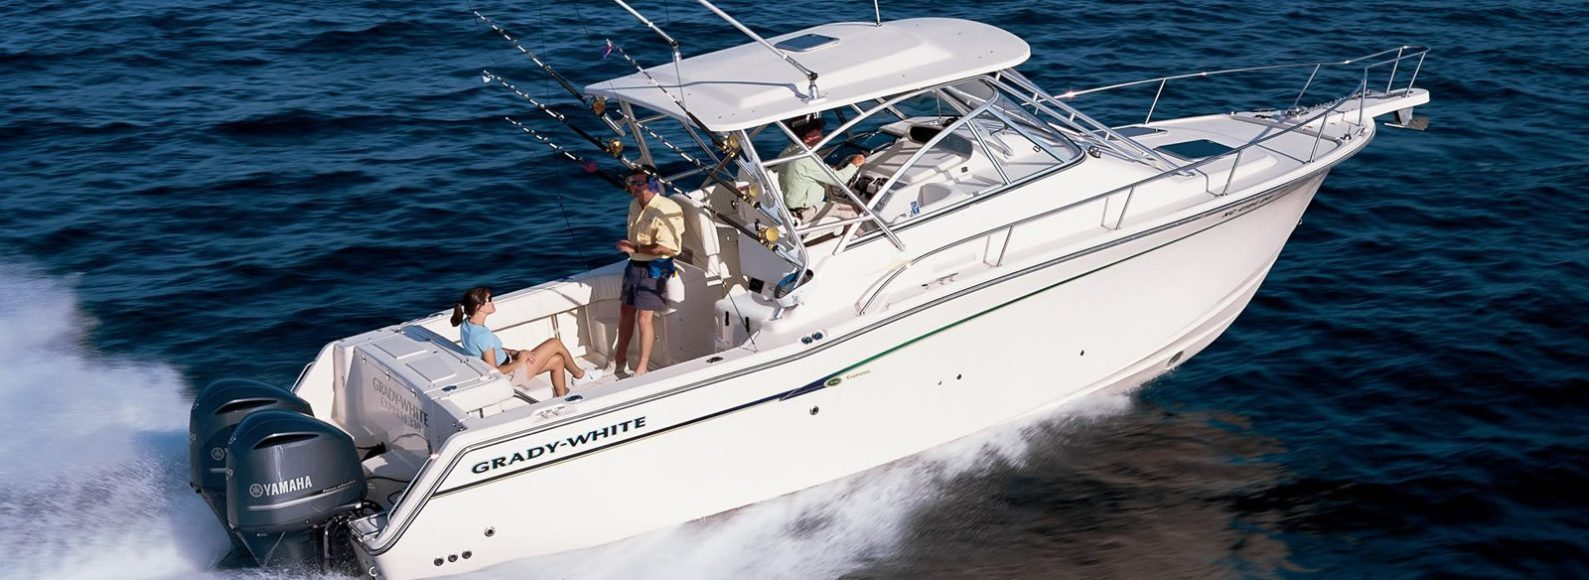 Grady White fishing boat